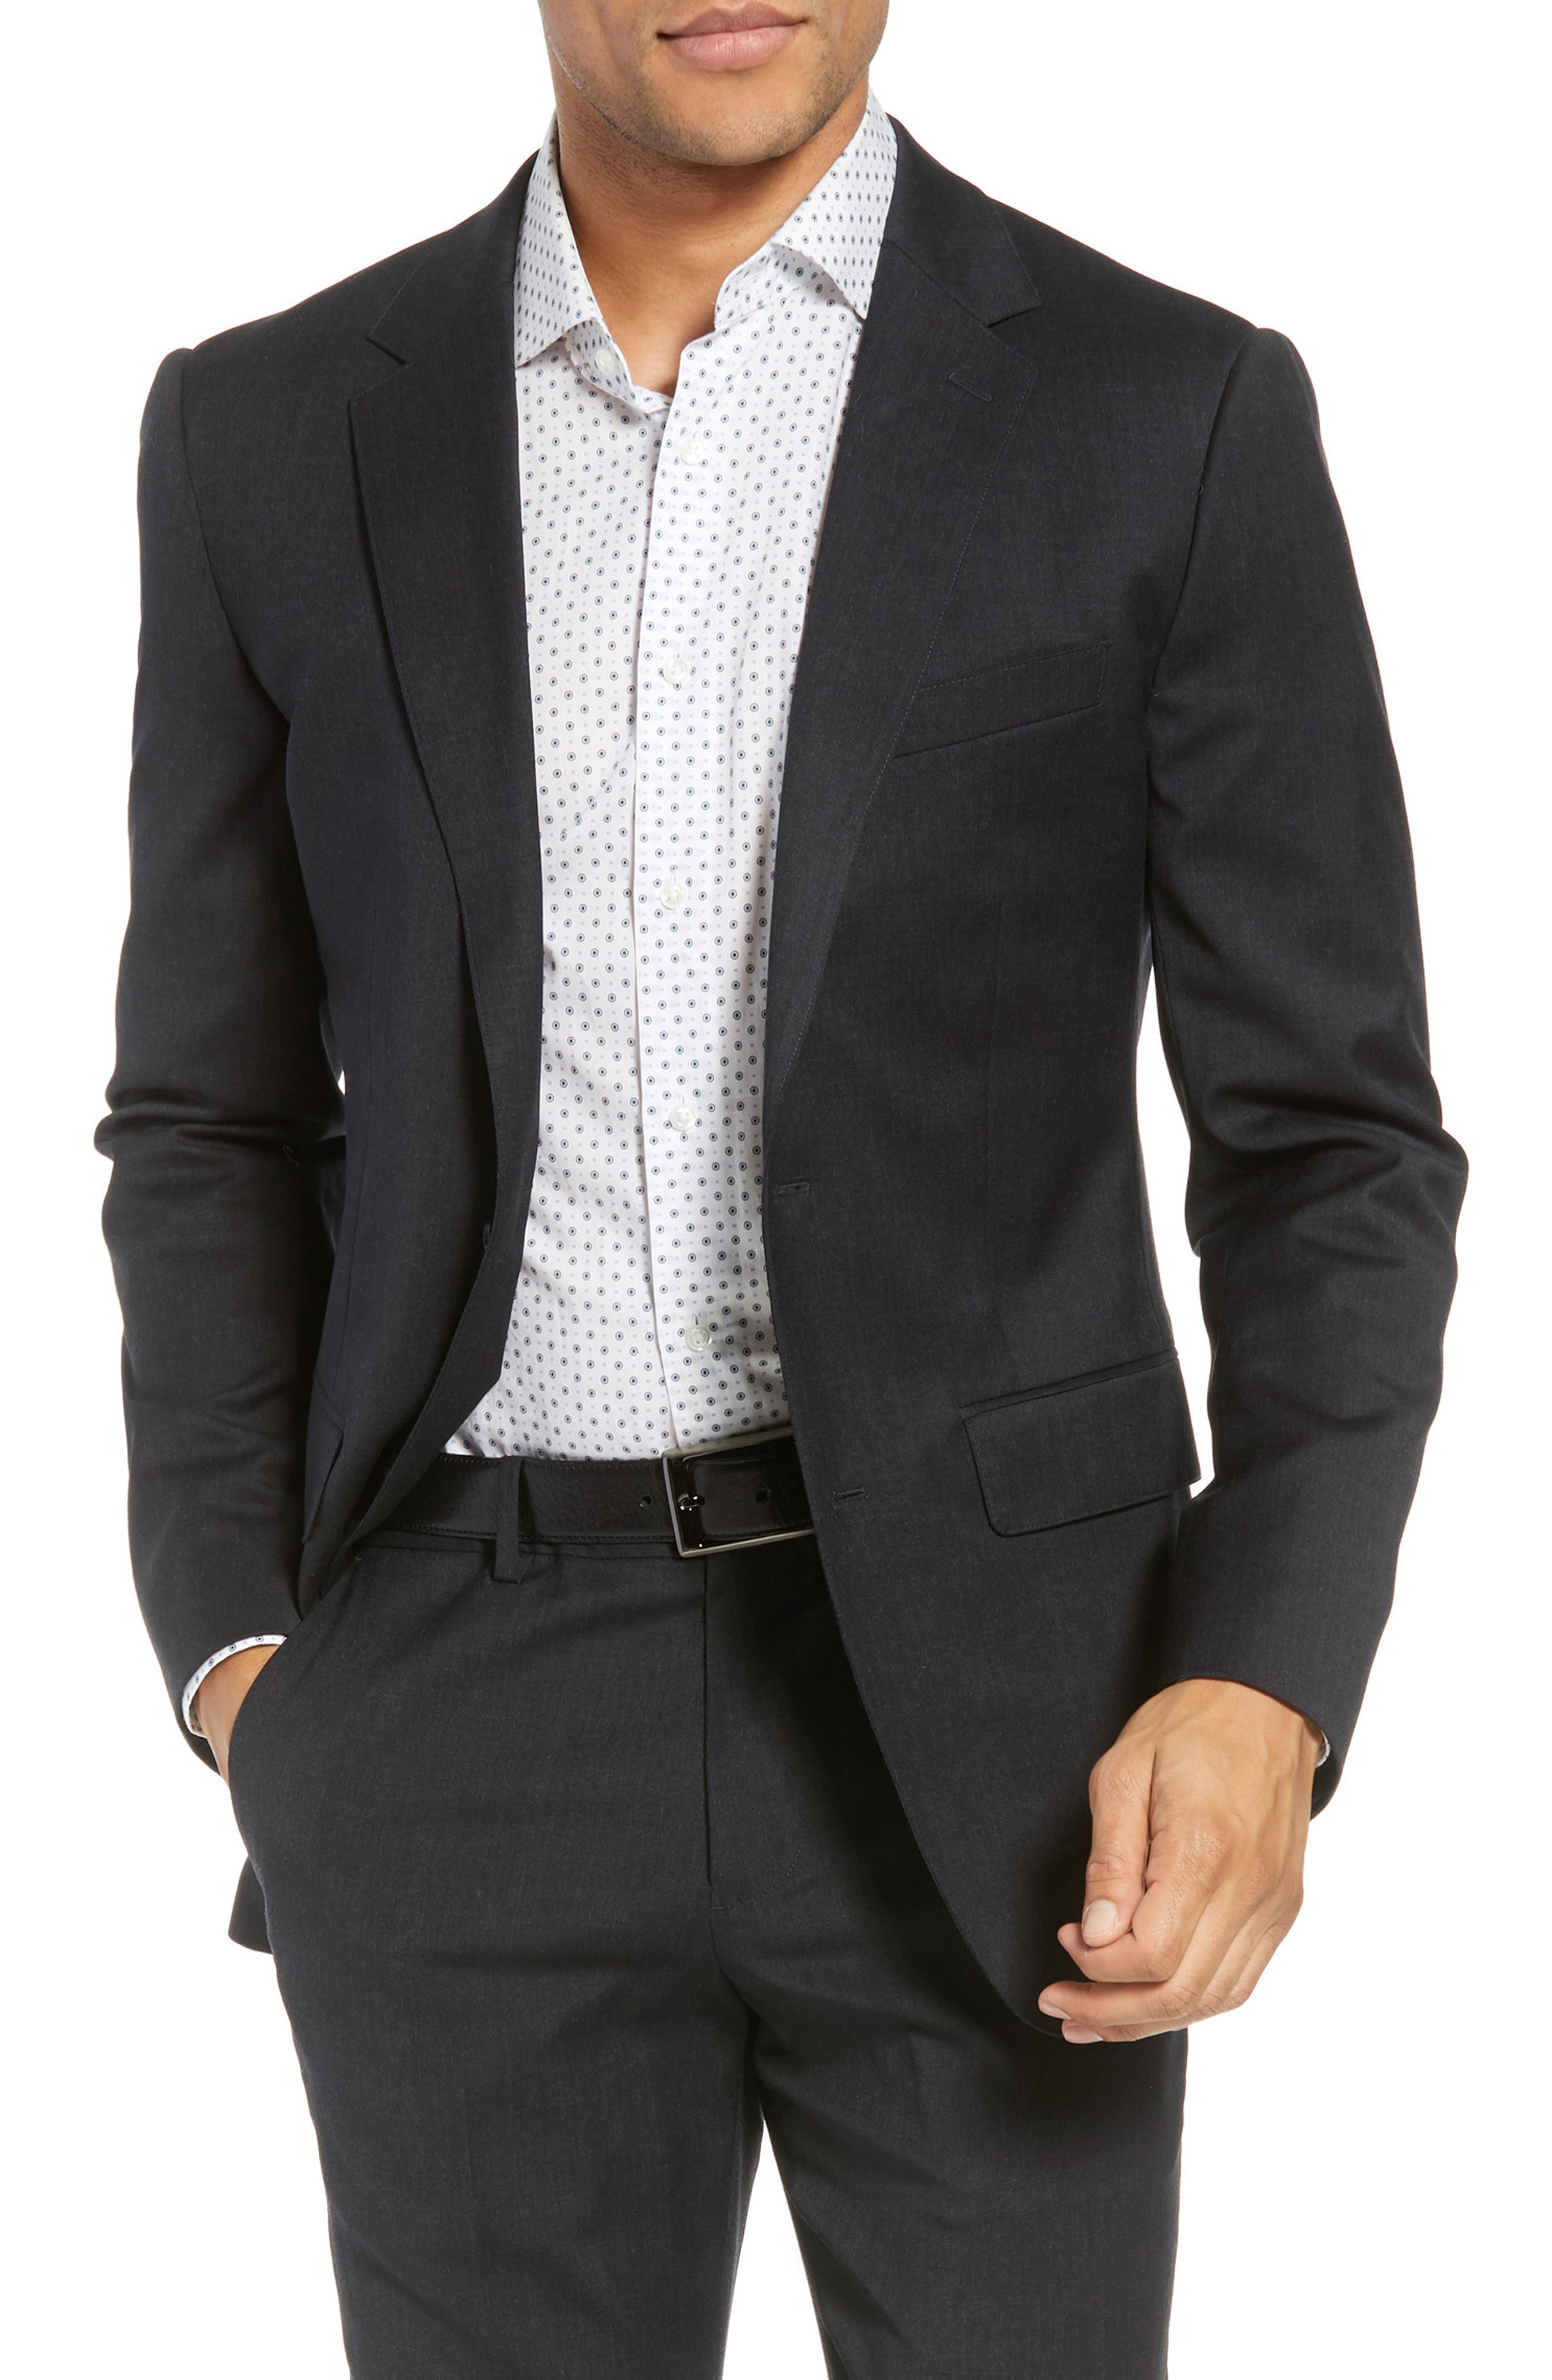 BONOBOS Jetsetter Slim Fit Stretch Wool Blazer, Main, color, CHARCOAL